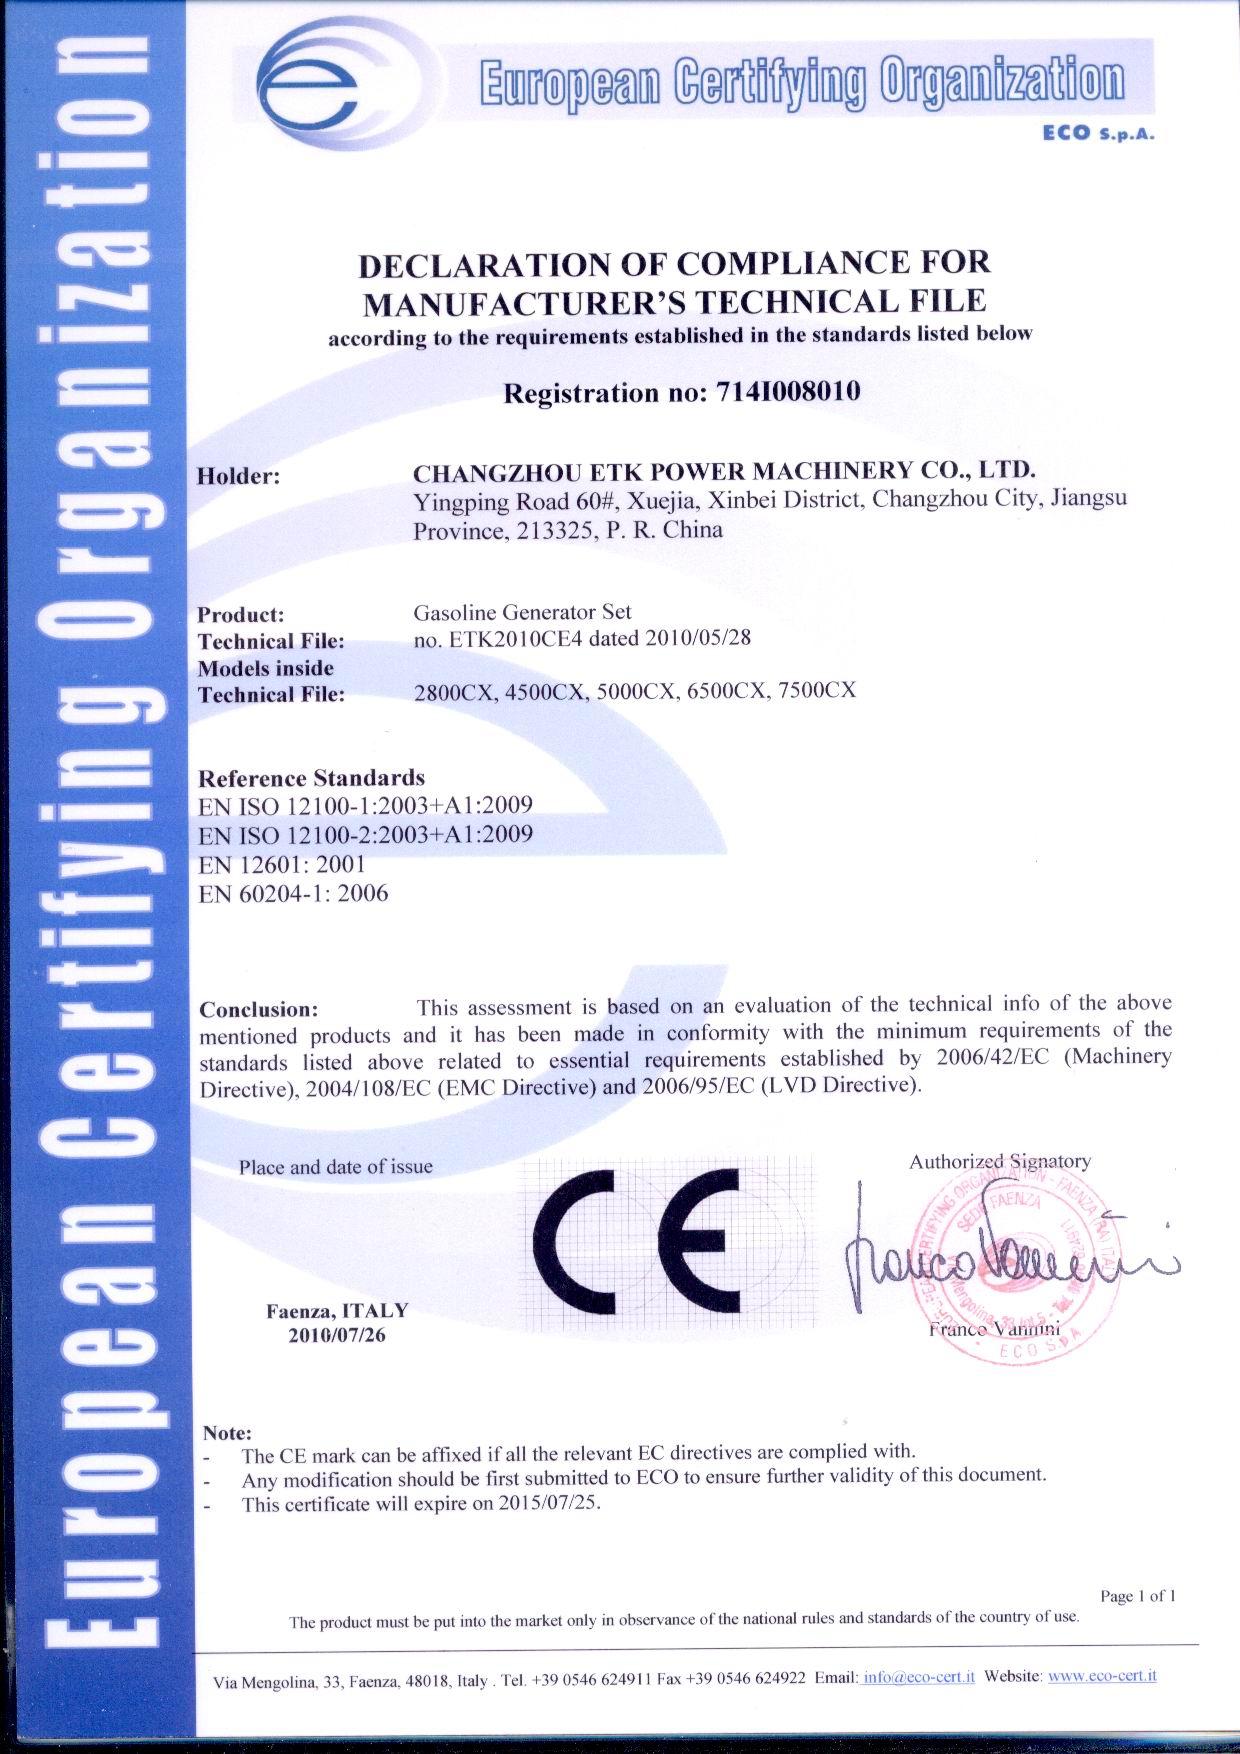 CE-GASOLINE GENERATOR SET